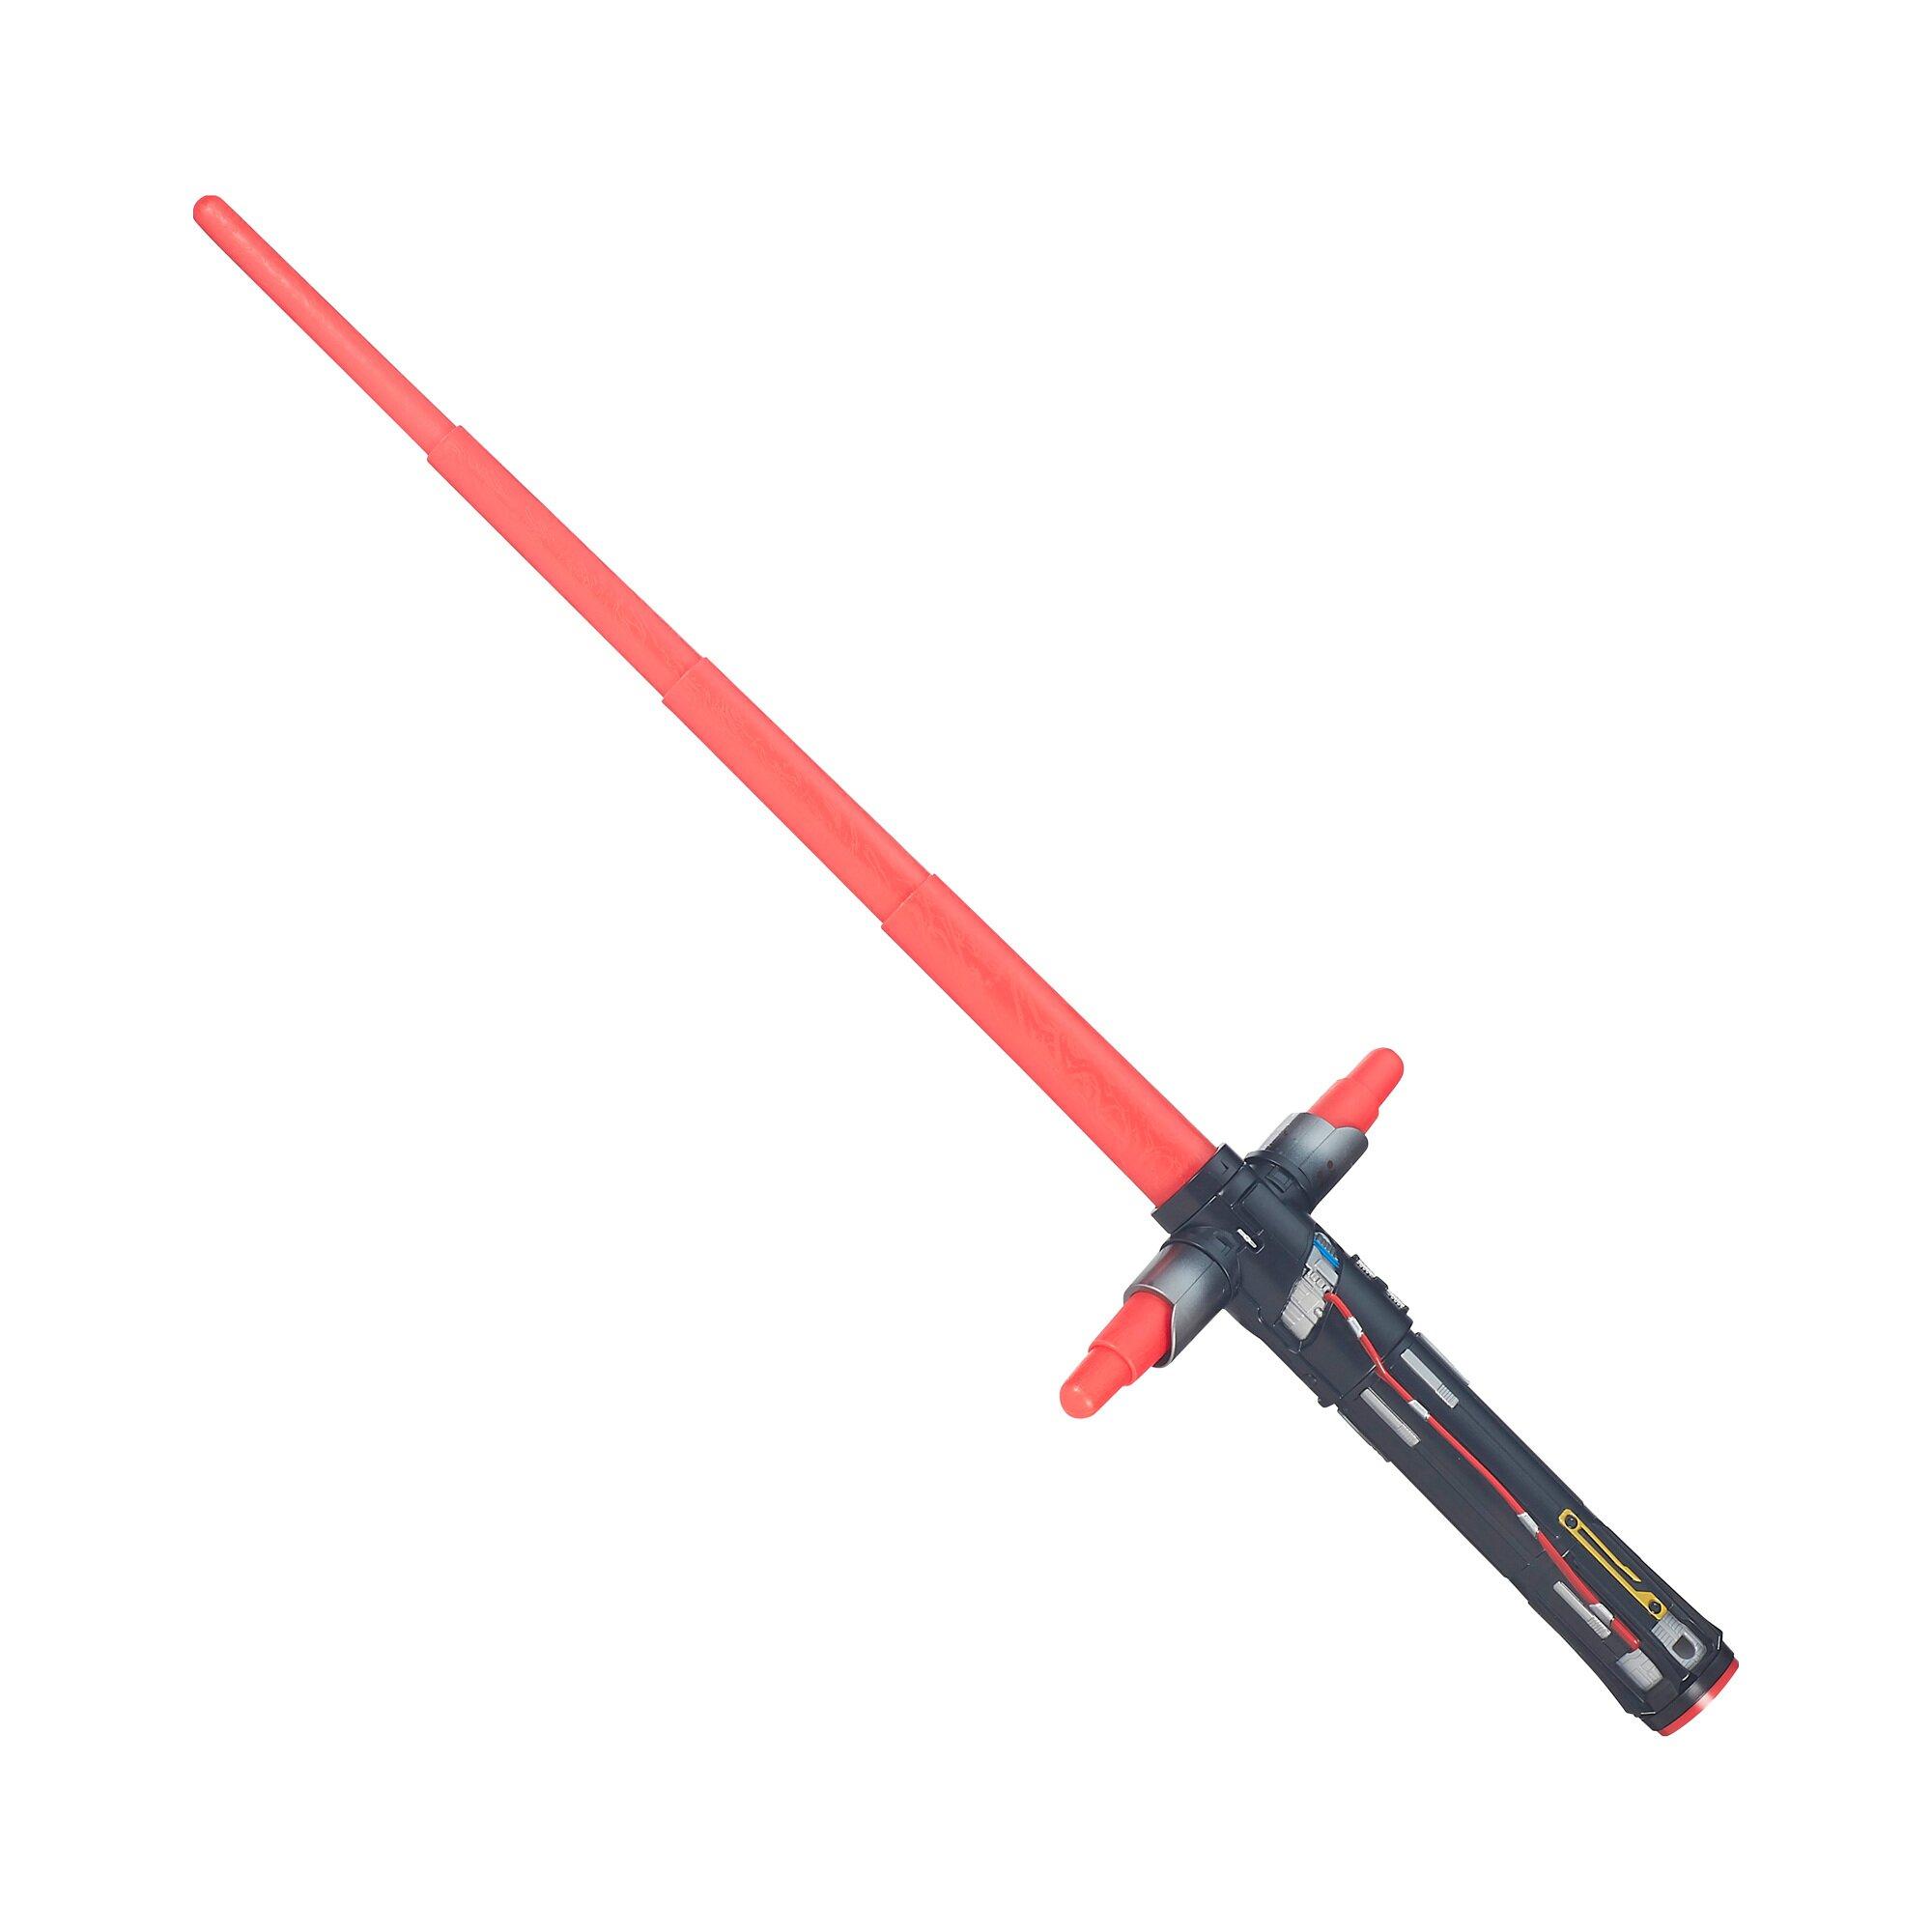 hasbro-kylo-ren-basislichtschwert